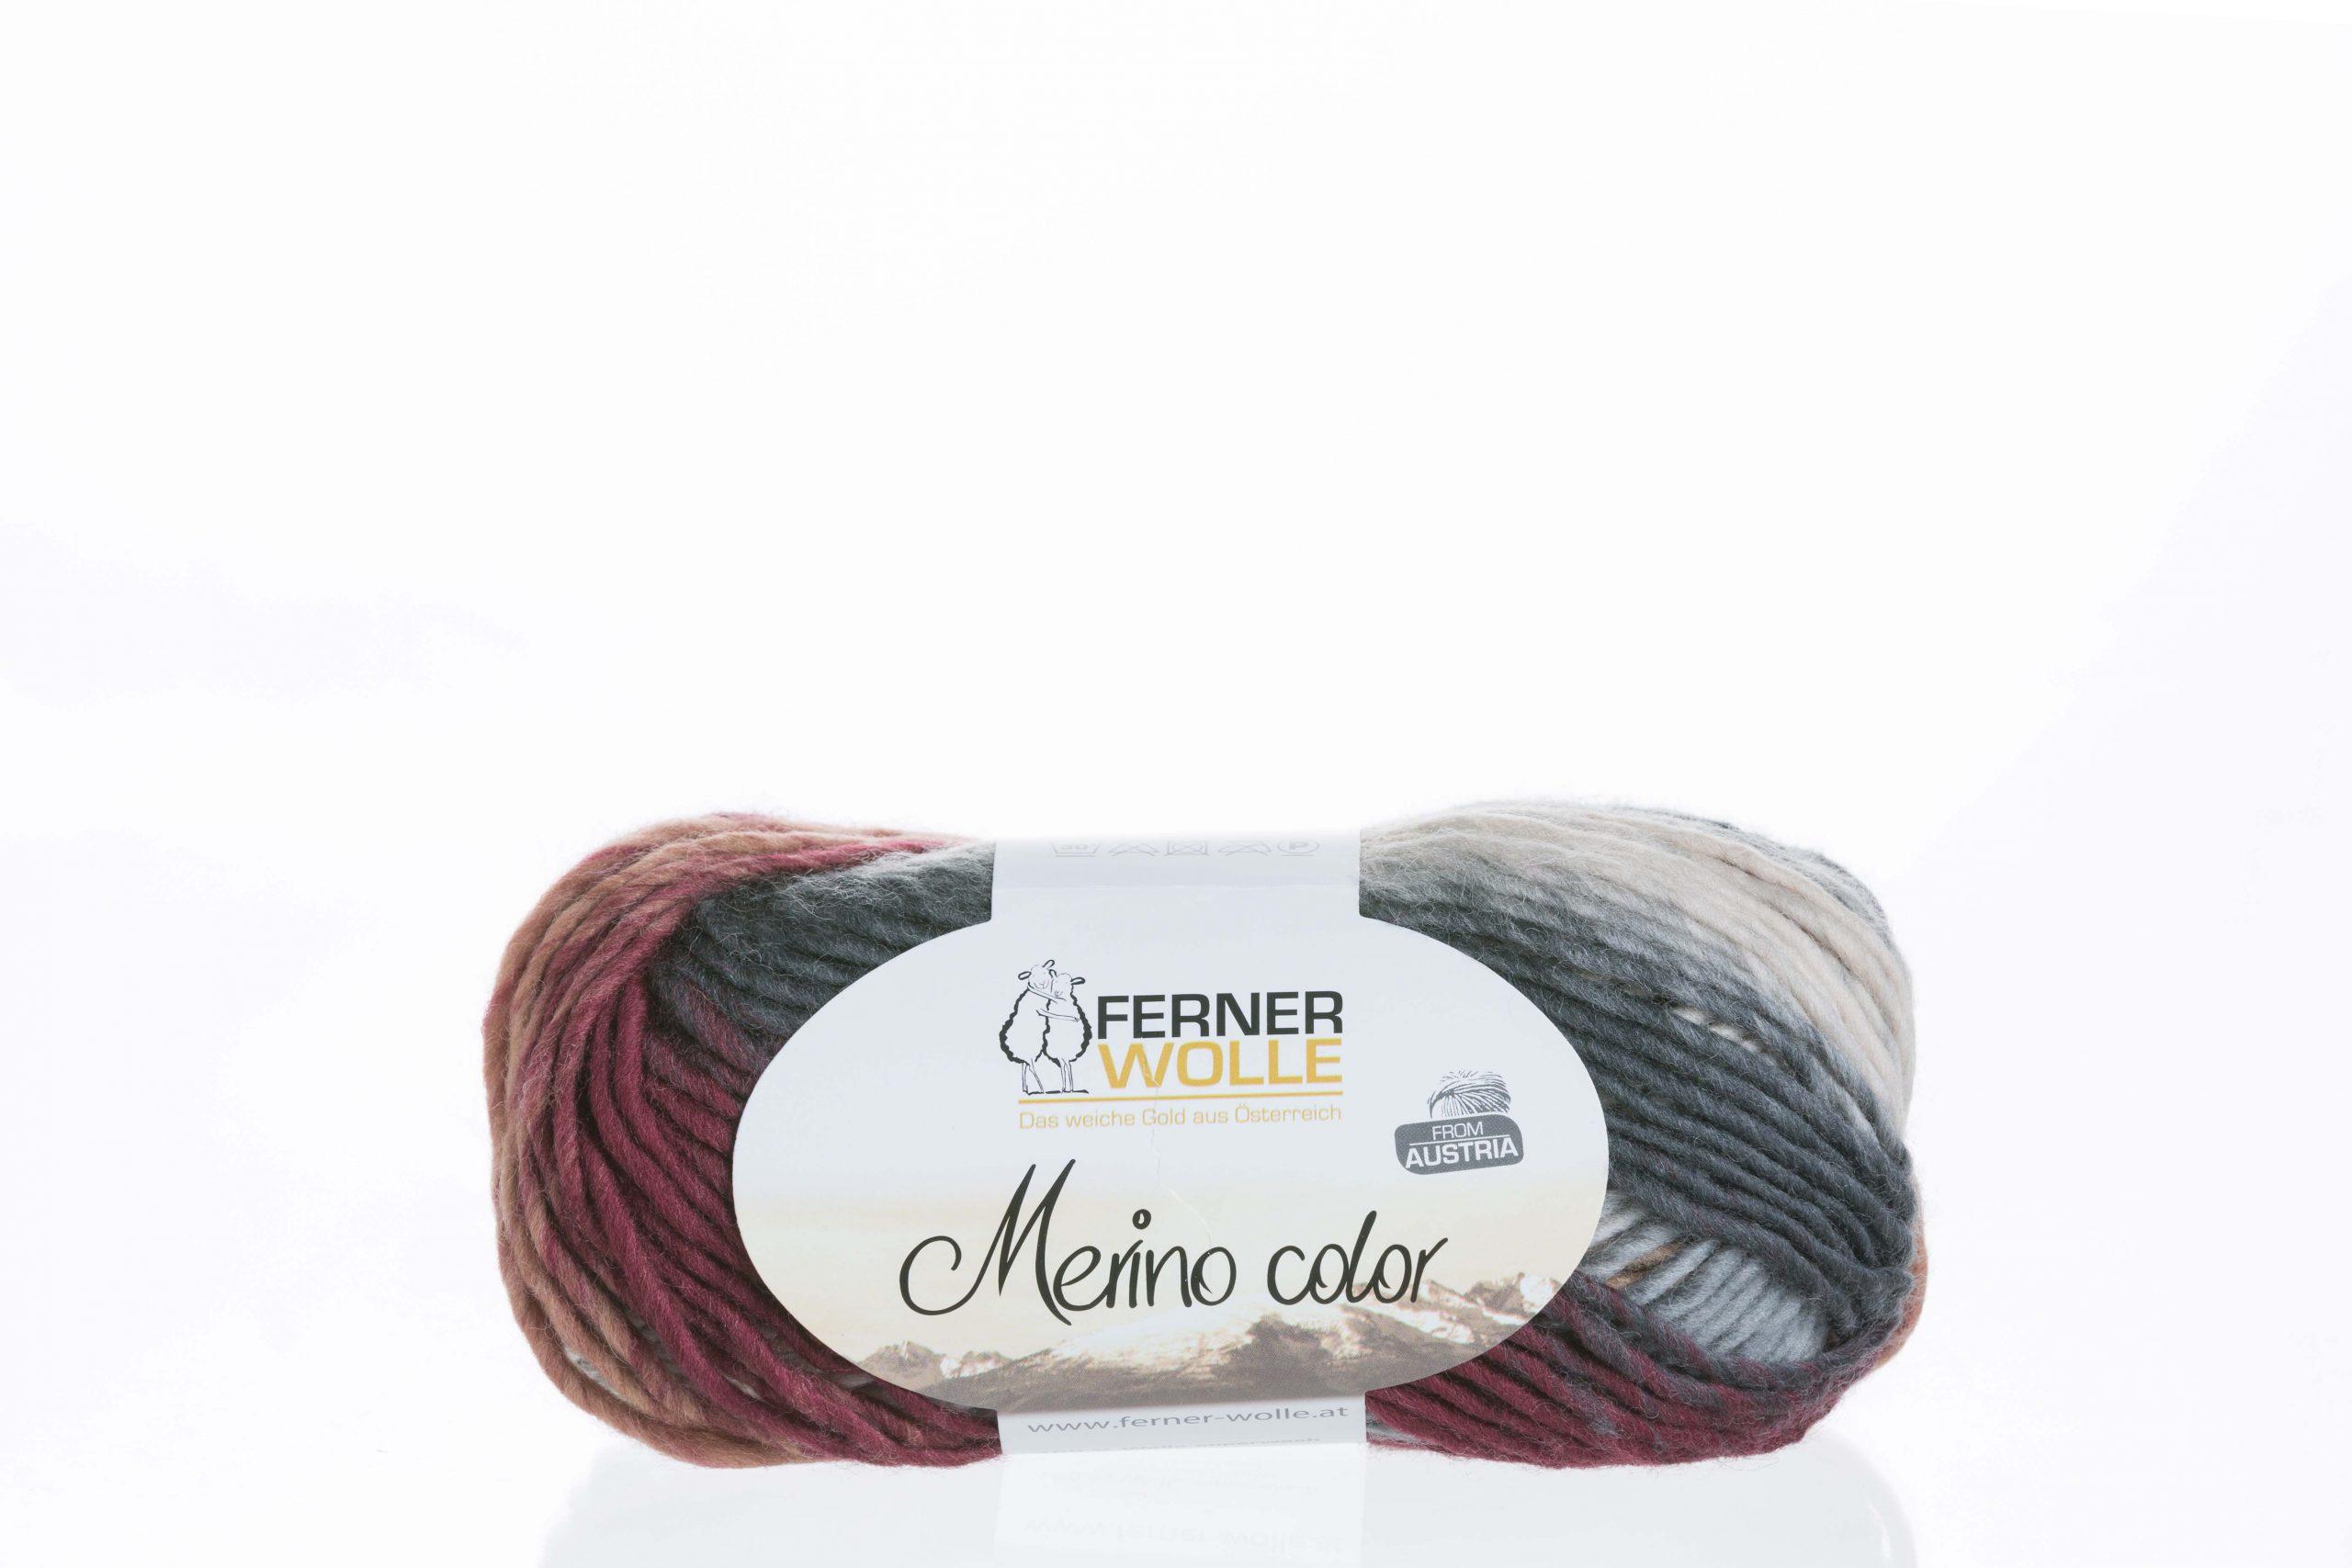 Merino color von Ferner Wolle Farbe 12